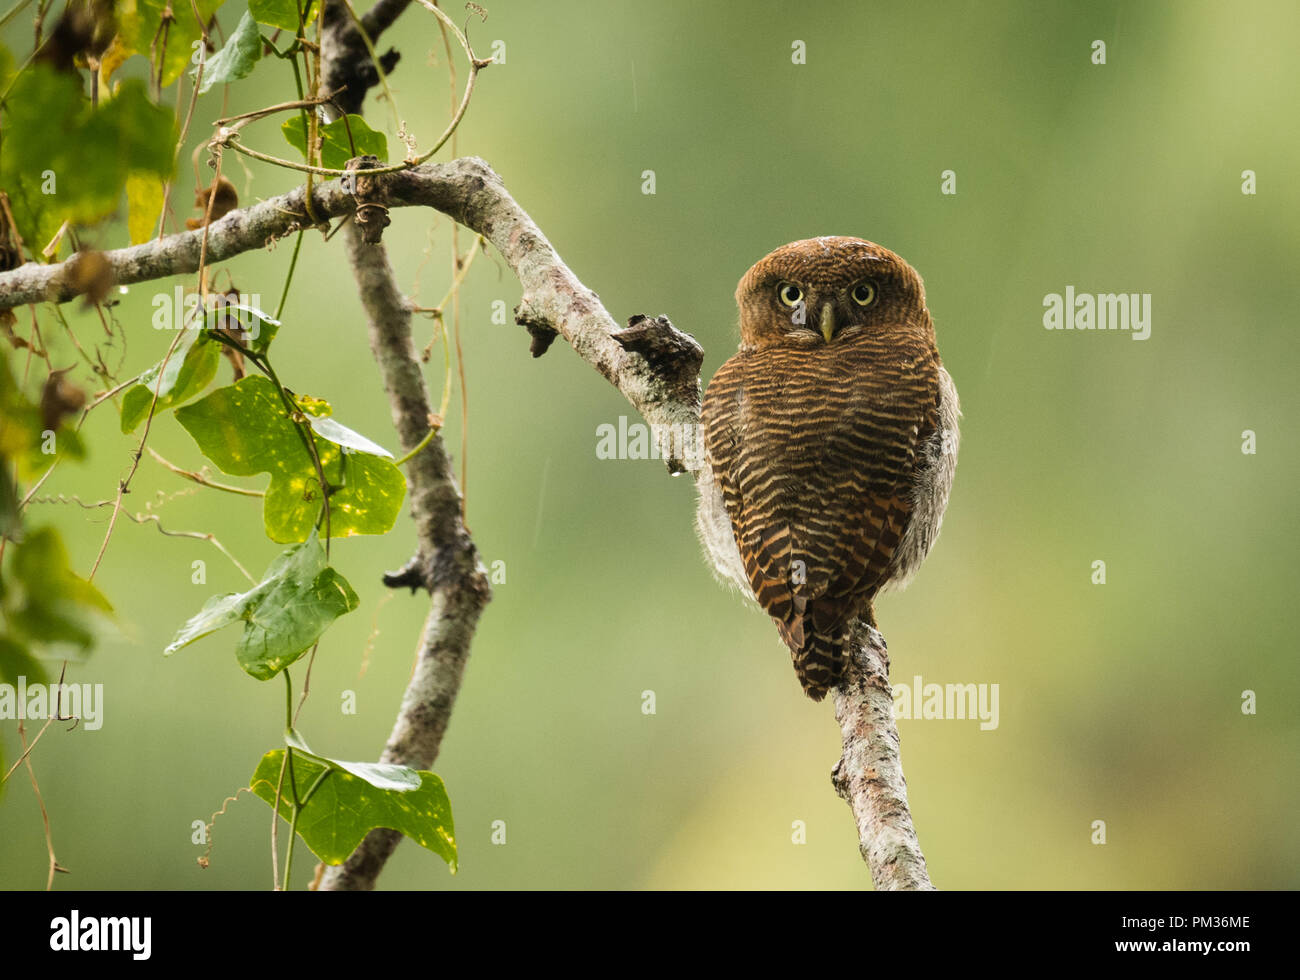 Jungle owlet or barred jungle owlet (Glaucidium radiatum) Stock Photo